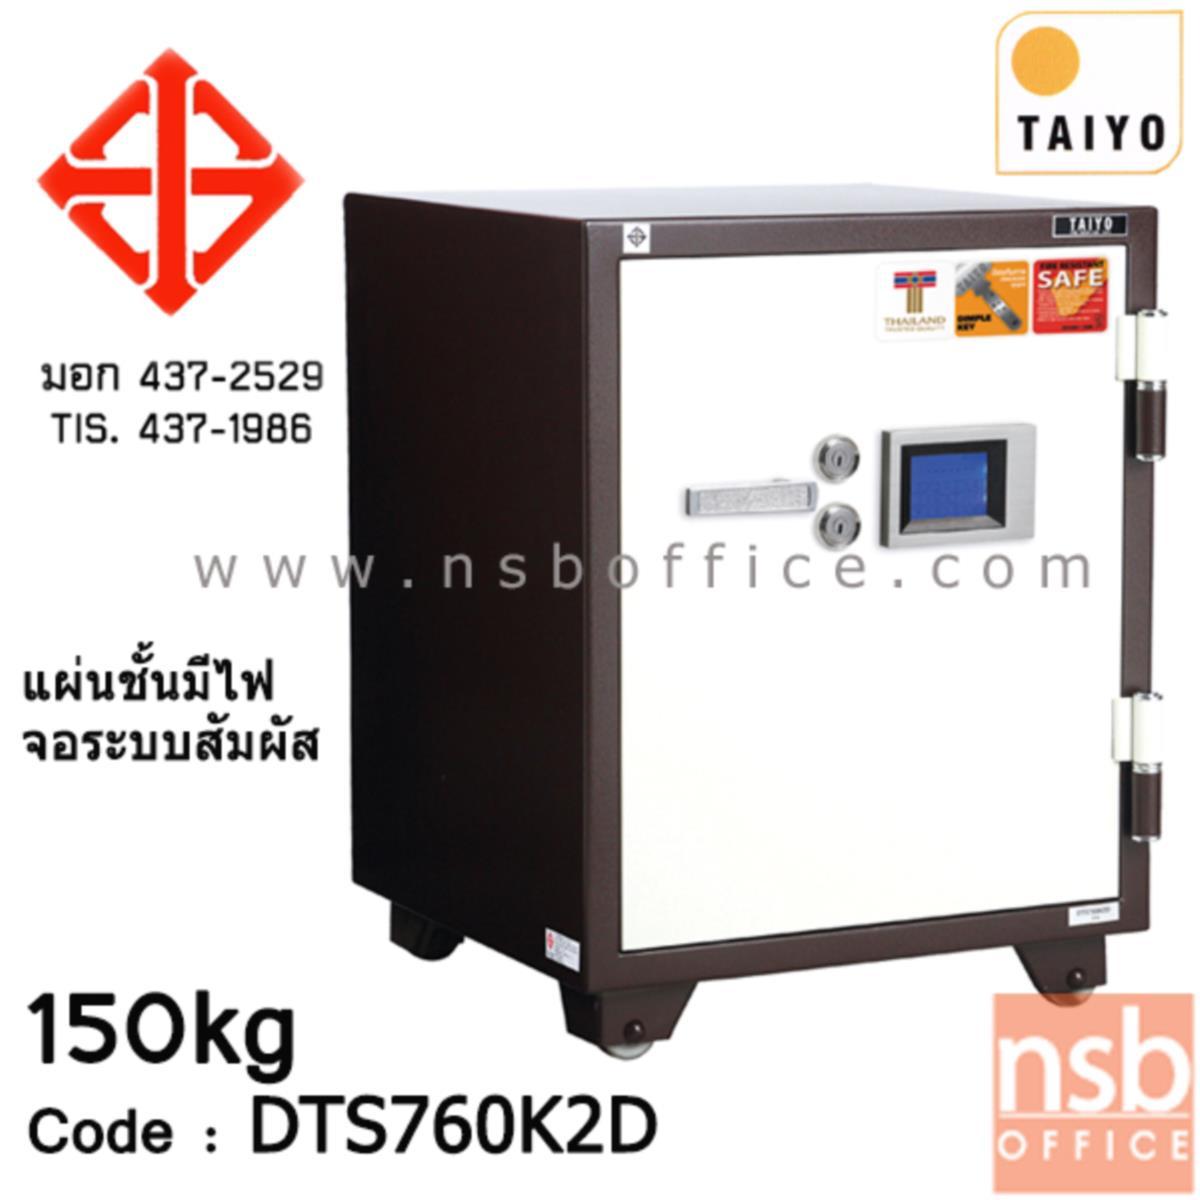 F01A059:ตู้เซฟ Taiyo ระบบดิจิตอล จอสัมผัส รุ่น 150 กก. 2 กุญแจ 1 รหัส (DTS 760 K2D)